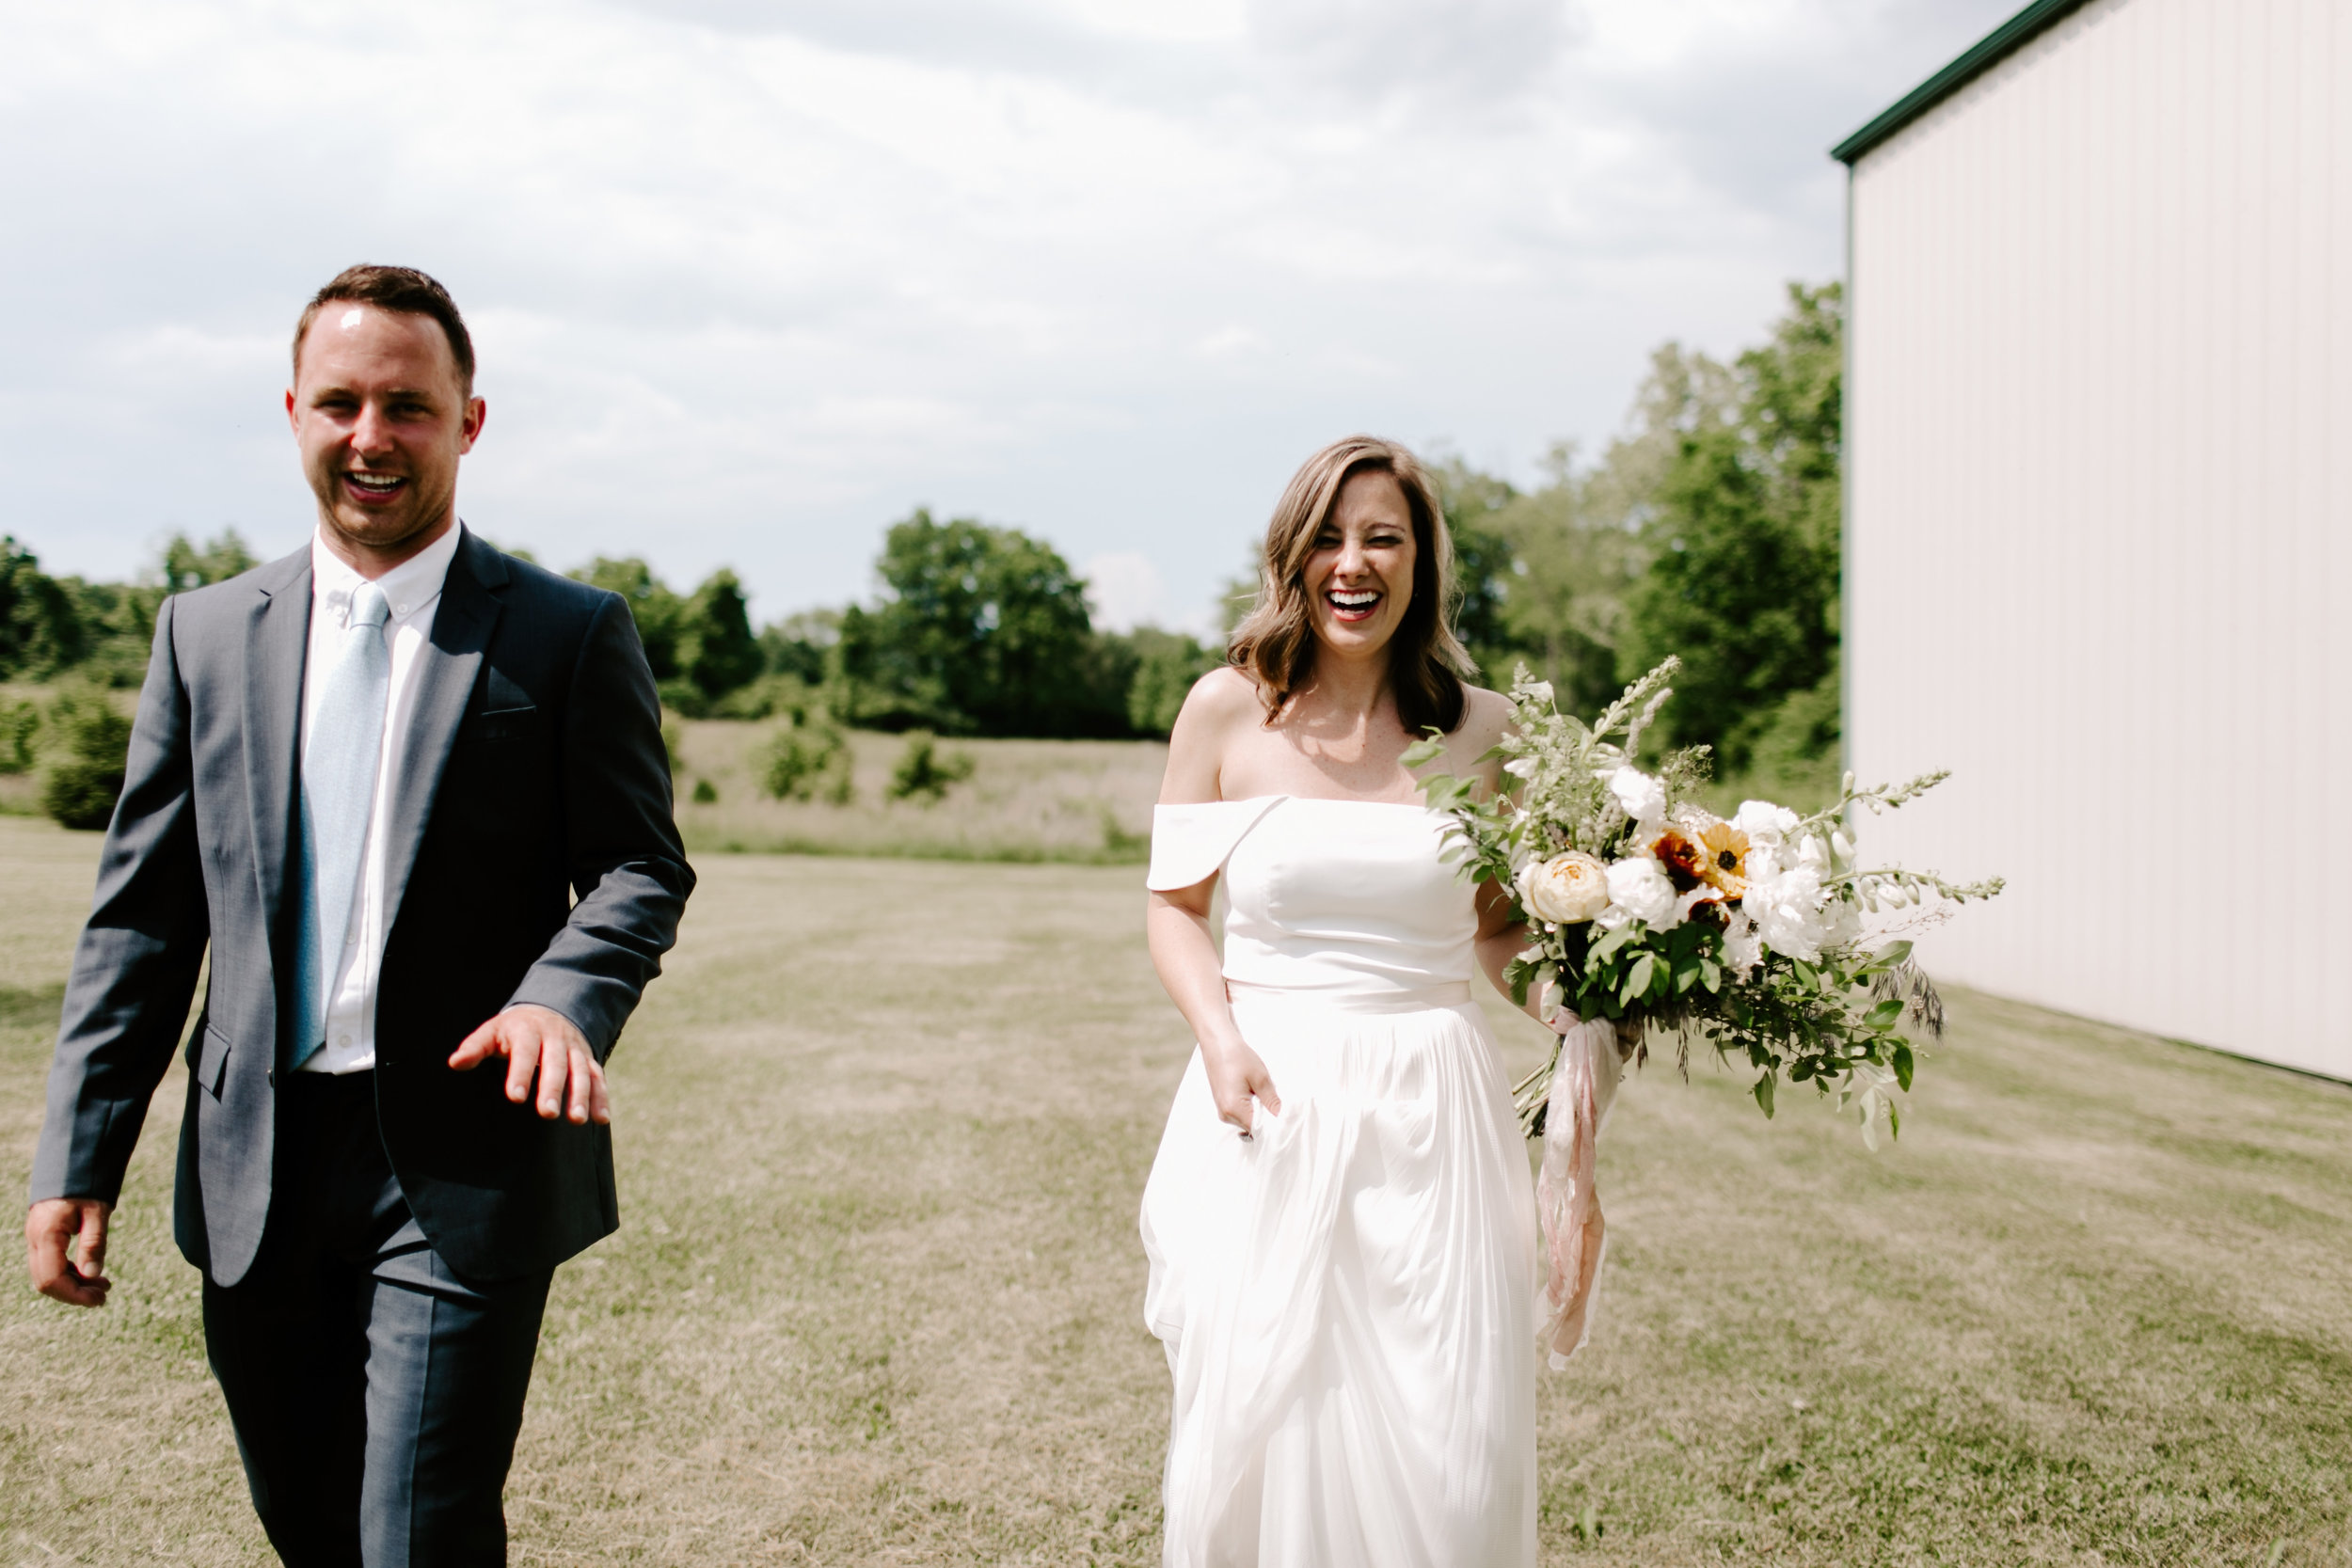 Liz_and_Jacob_surprise_wedding_Bloomington_Indiana_Emily_Elyse_Wehner_Photography_LLC-135.jpg